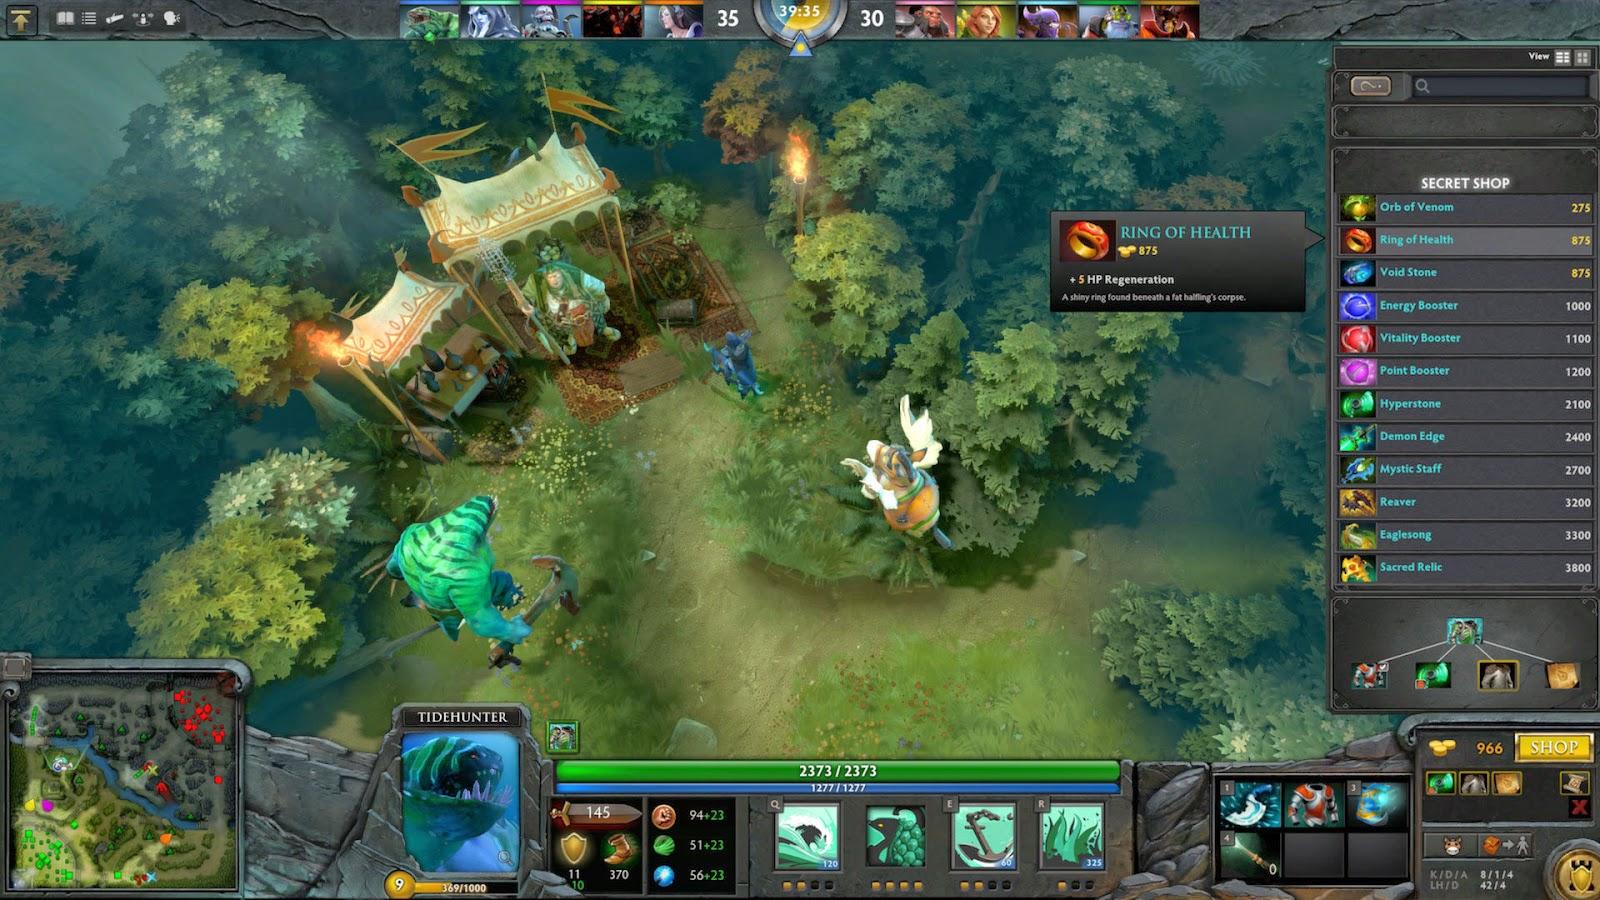 Dota 2 PC Game Free Download Offline